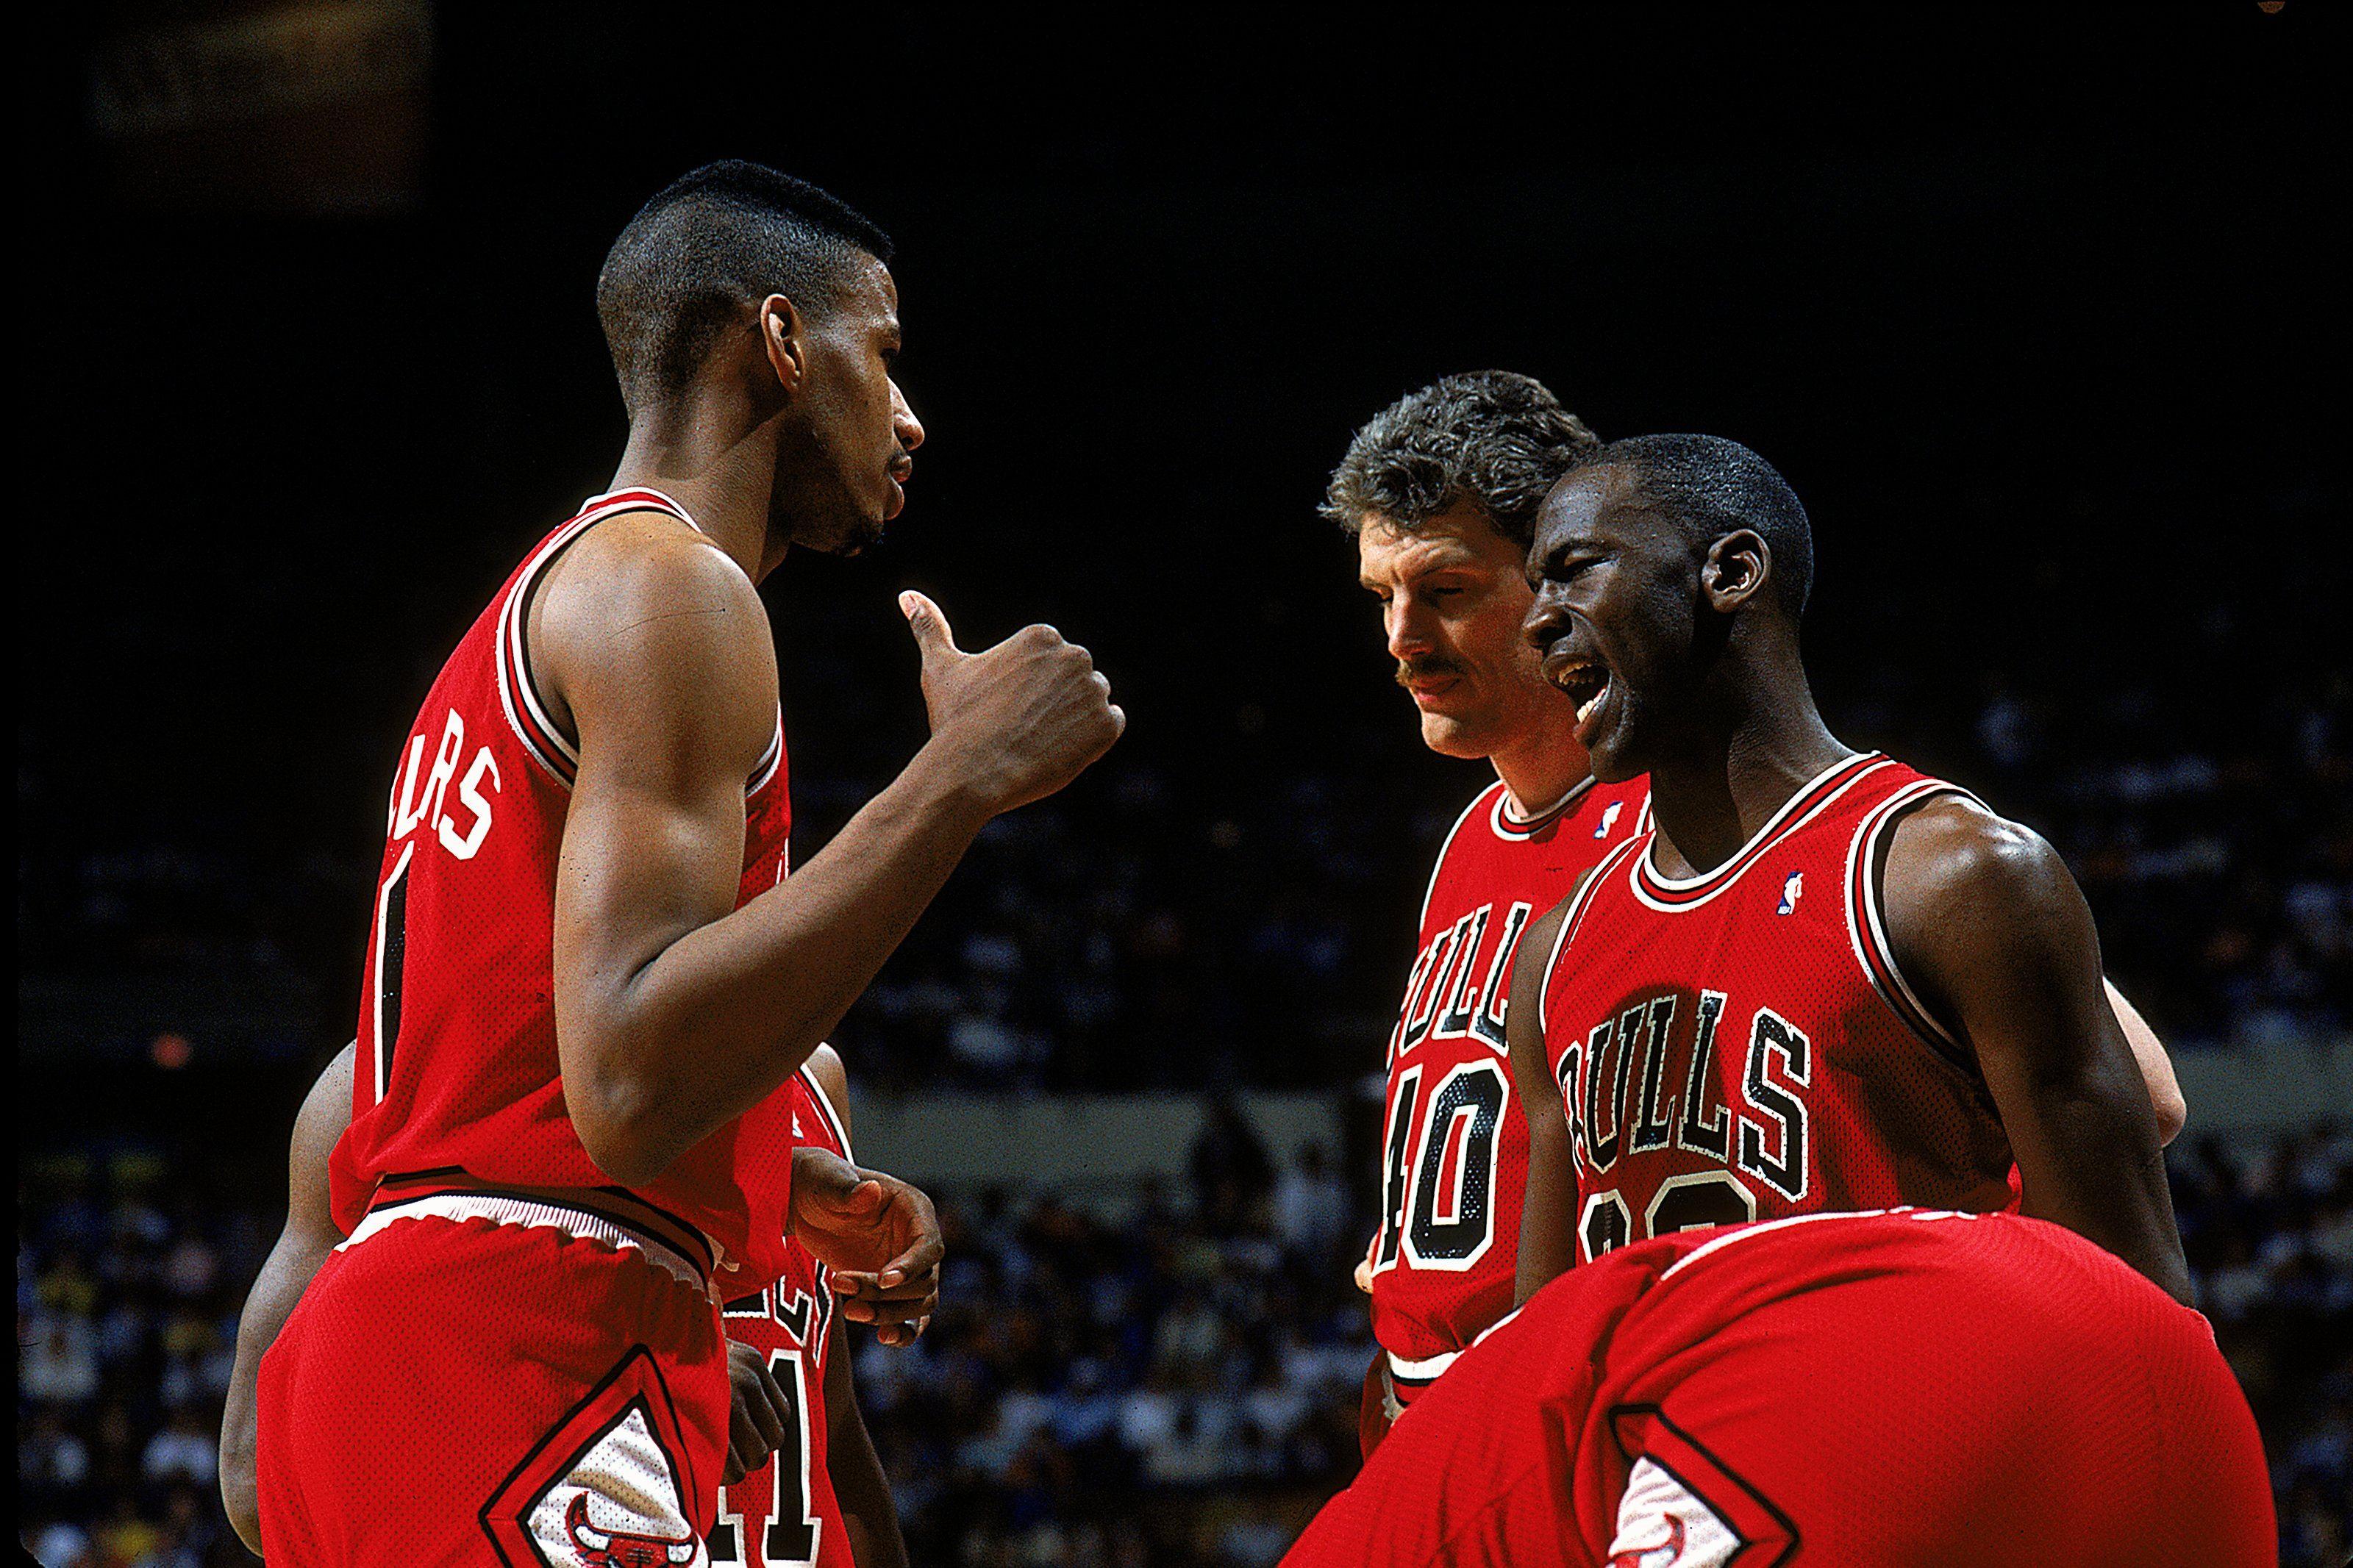 Brad Sellers Dave Corzine Michael Jordan early career 1987-88 season